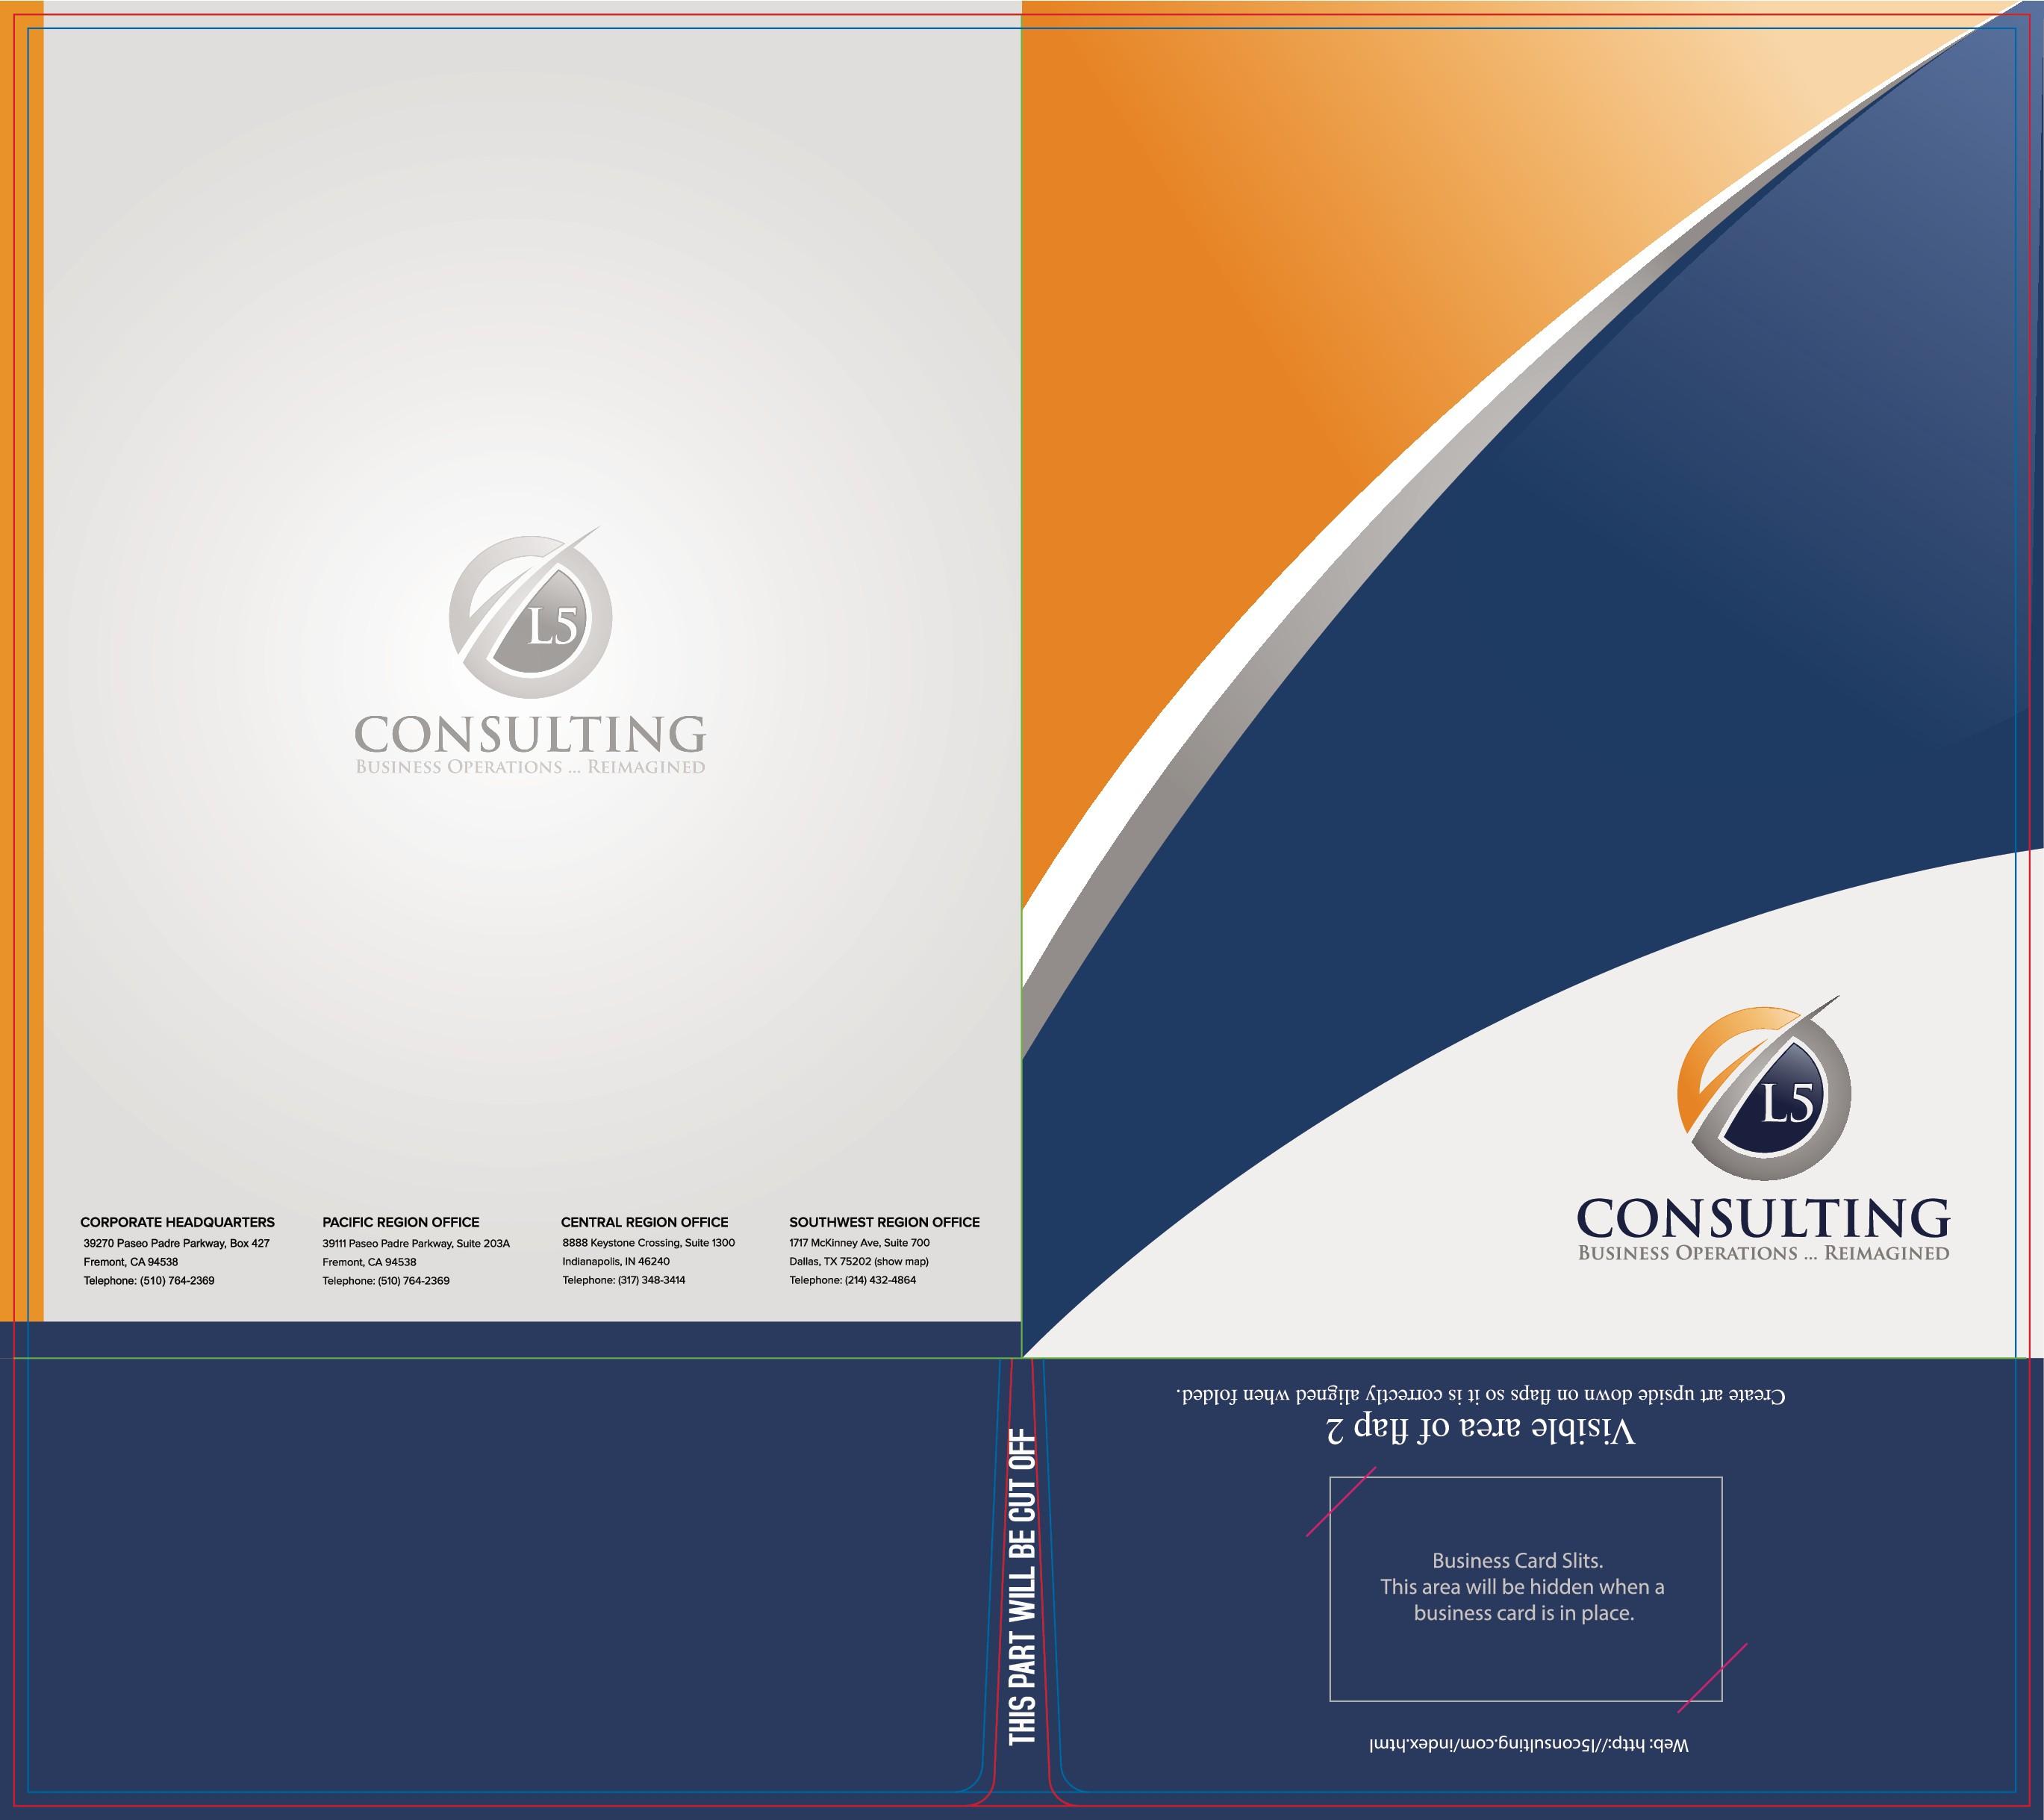 presentation folder for L5consulting